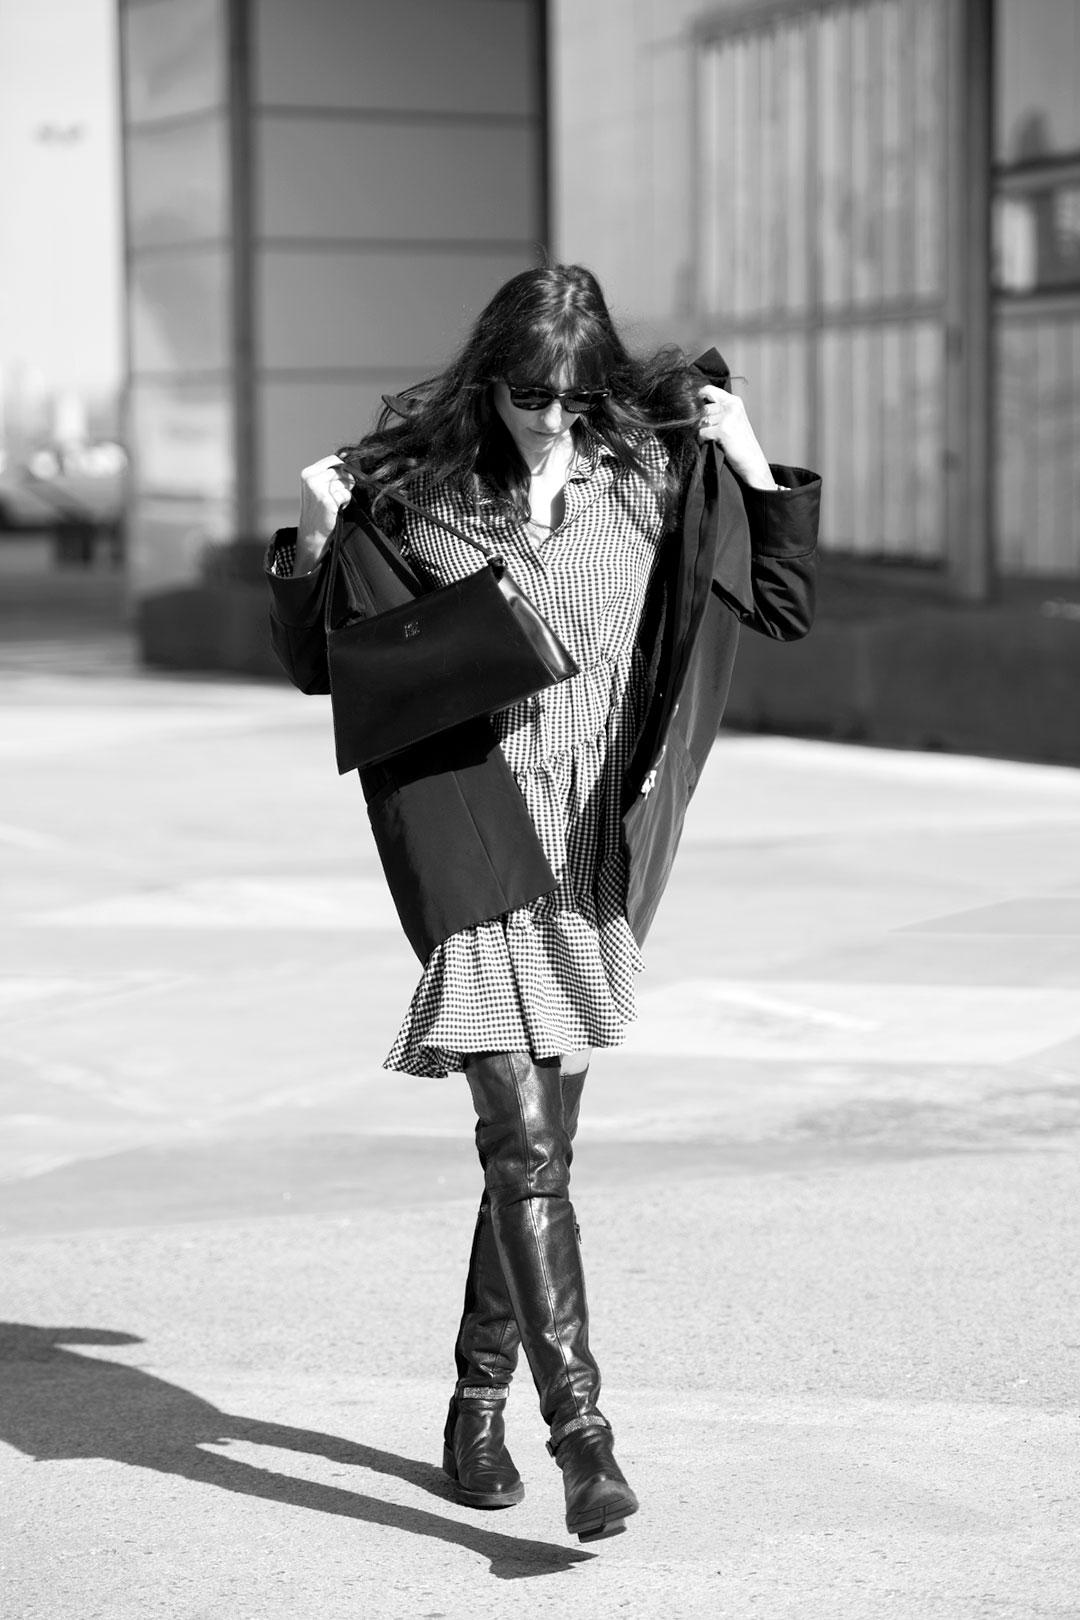 mbfwm-black-and-white-street-style-mitmeblog-bn-web-03